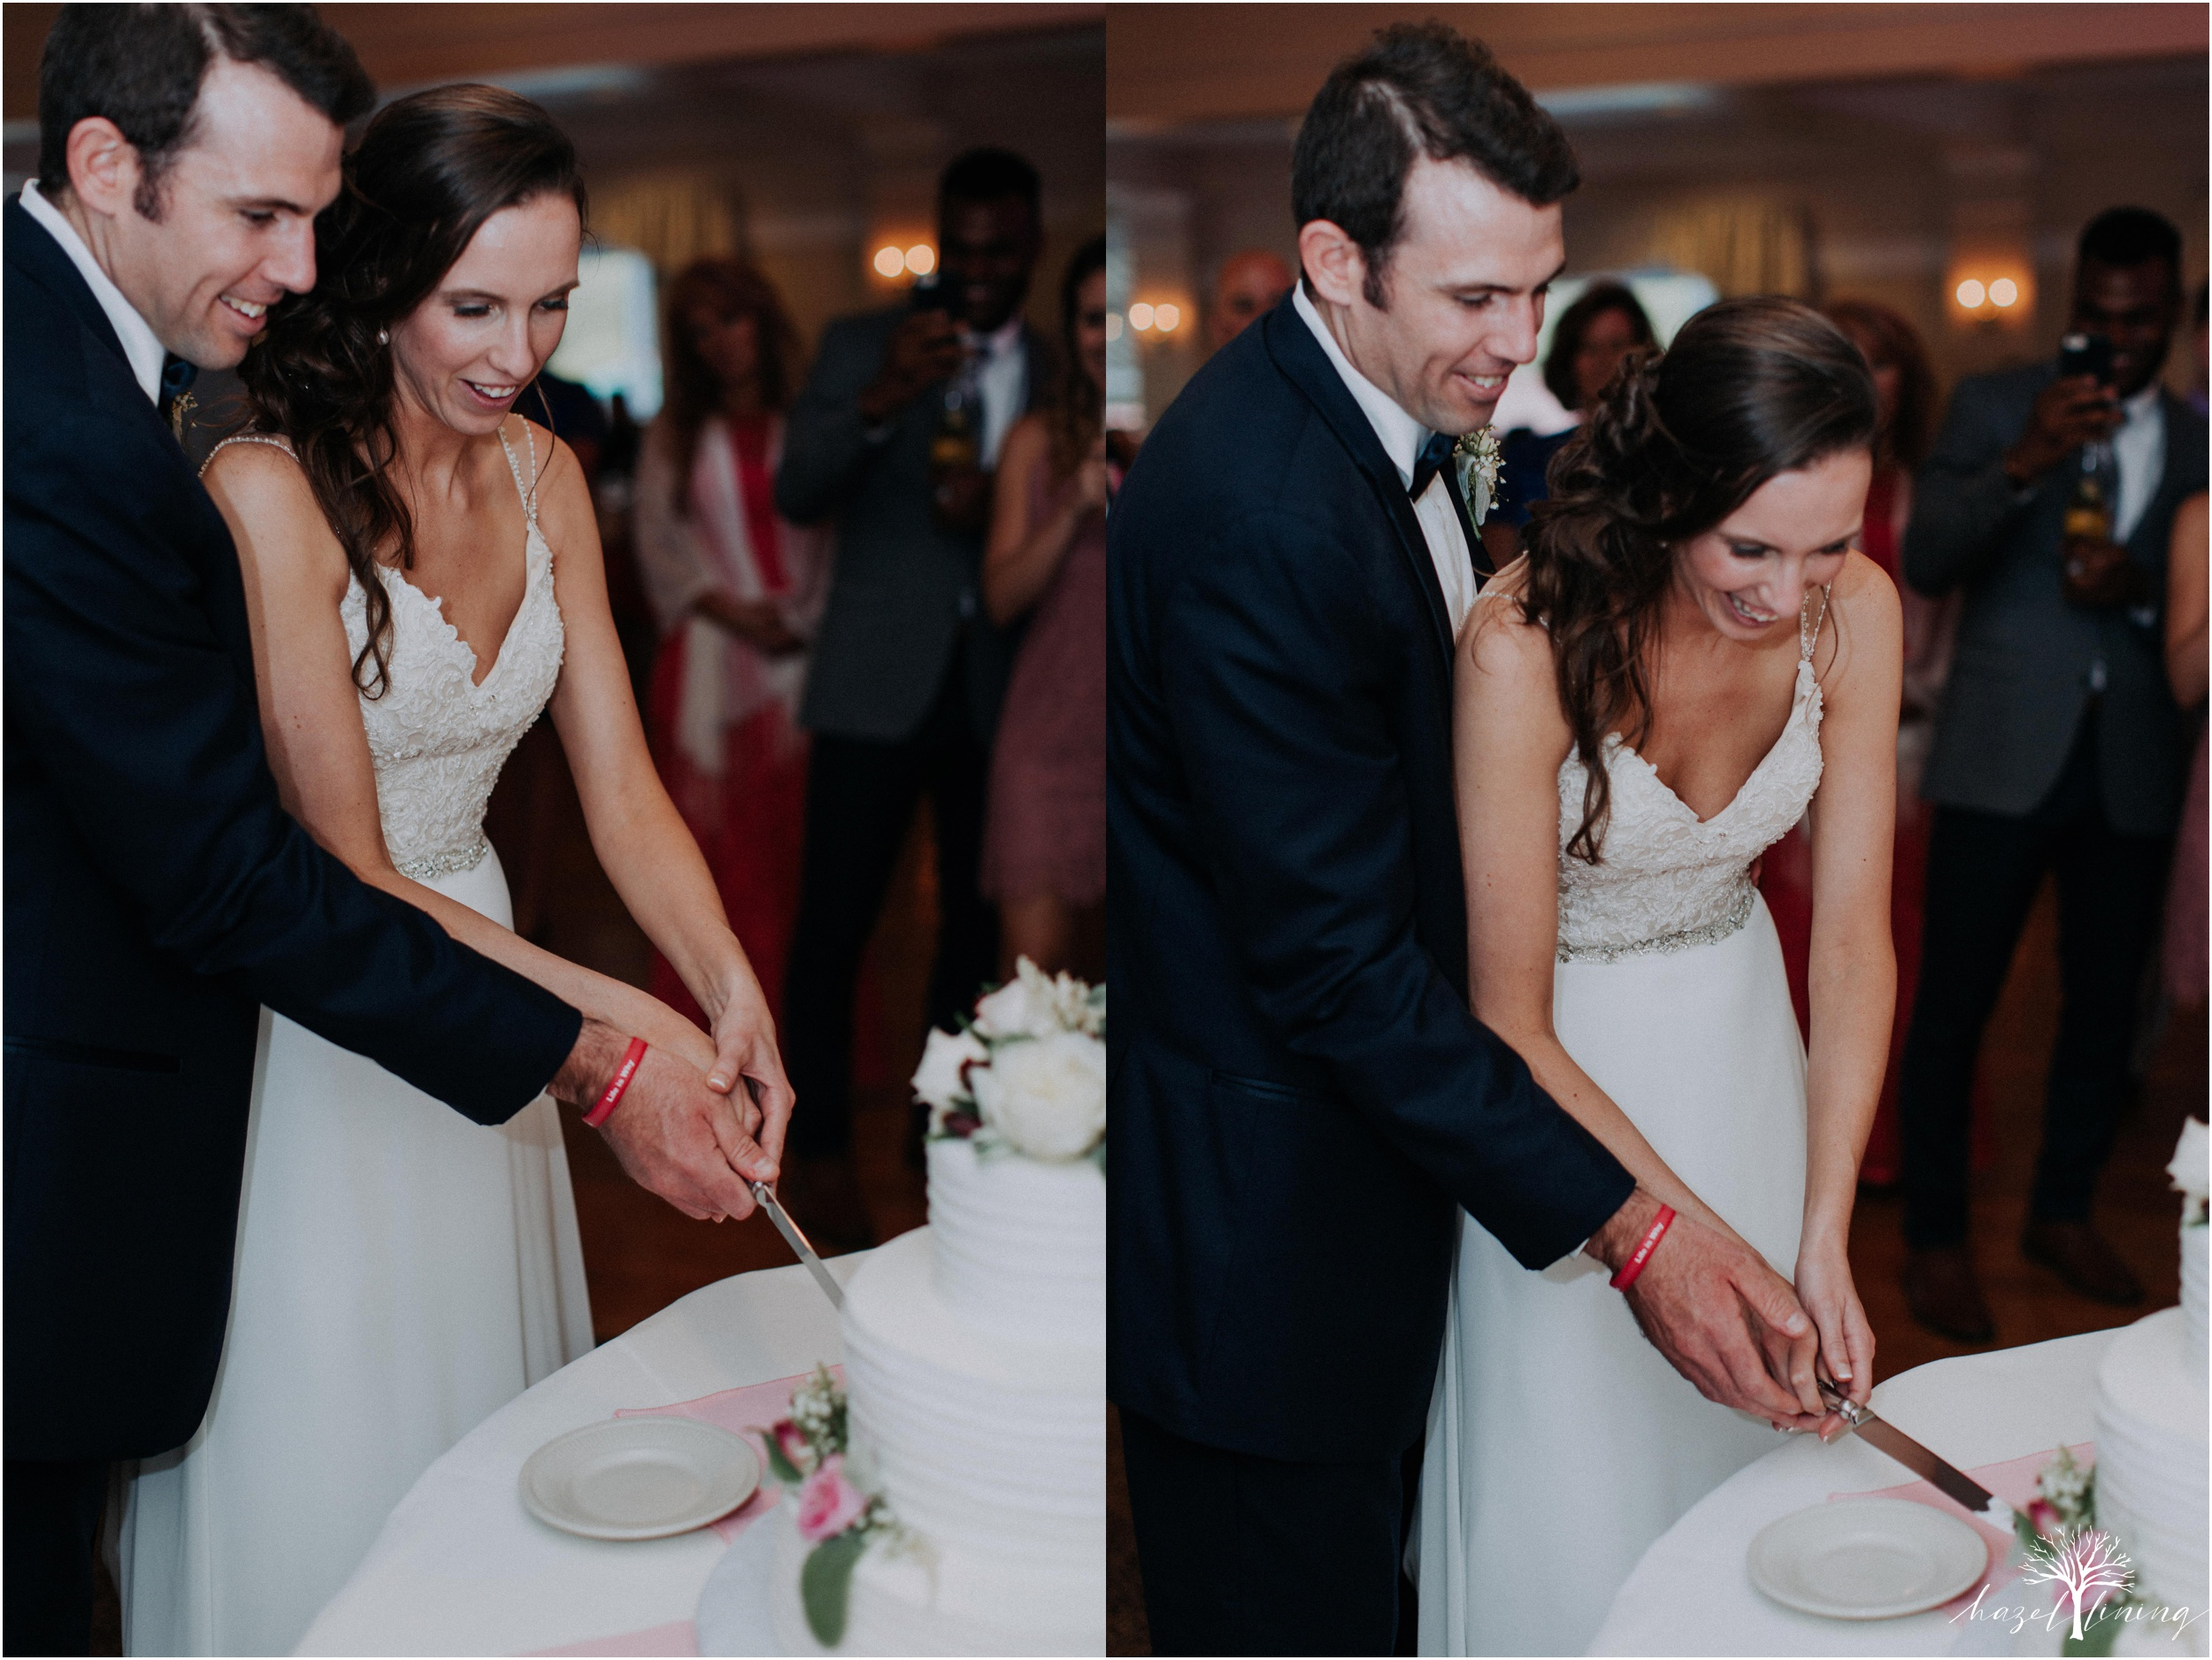 hazel-lining-travel-wedding-elopement-photography_0148.jpg